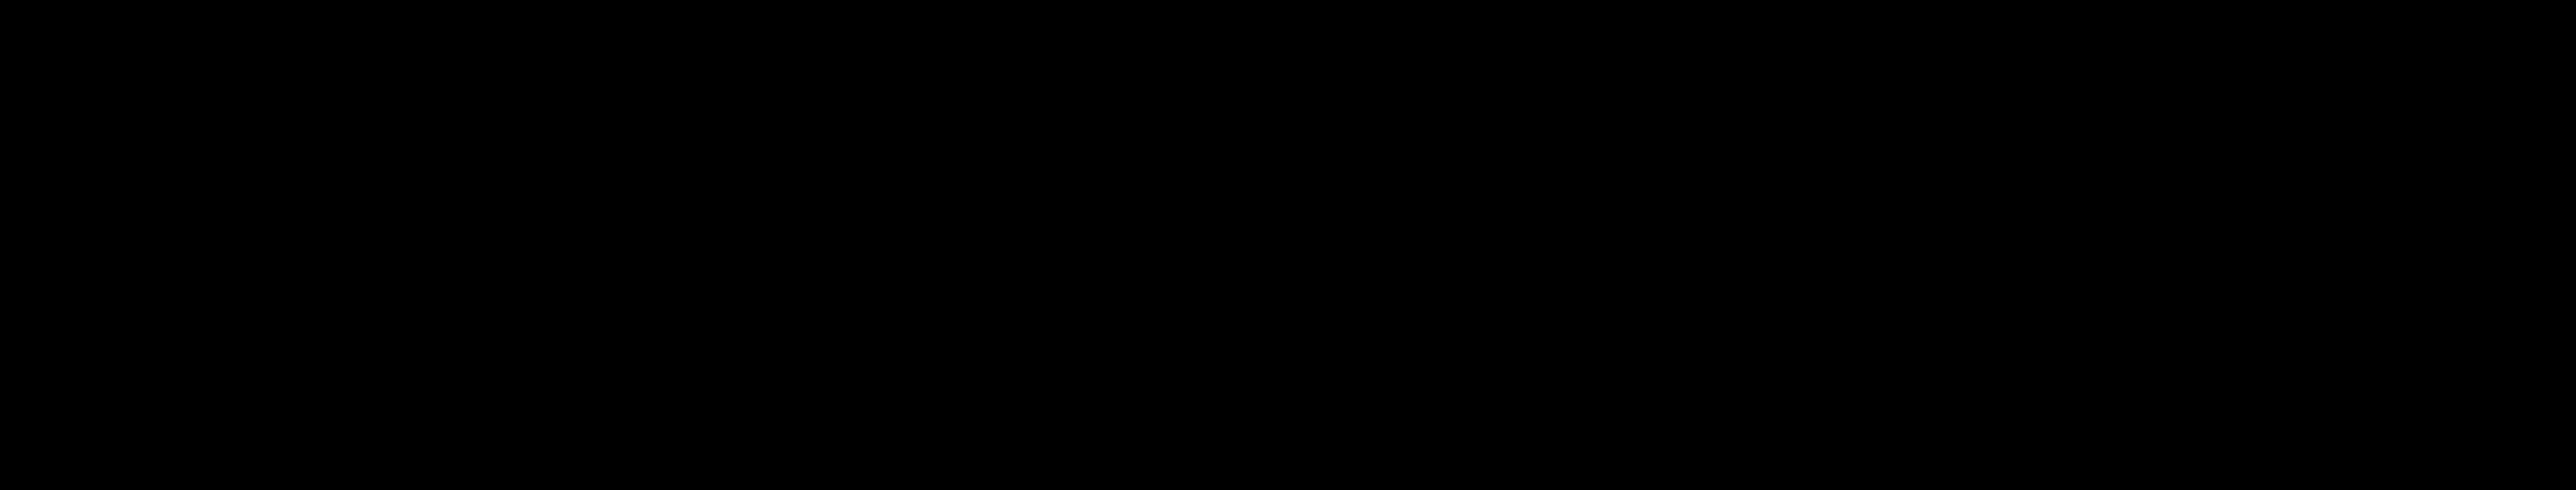 hodlr.rocks logo